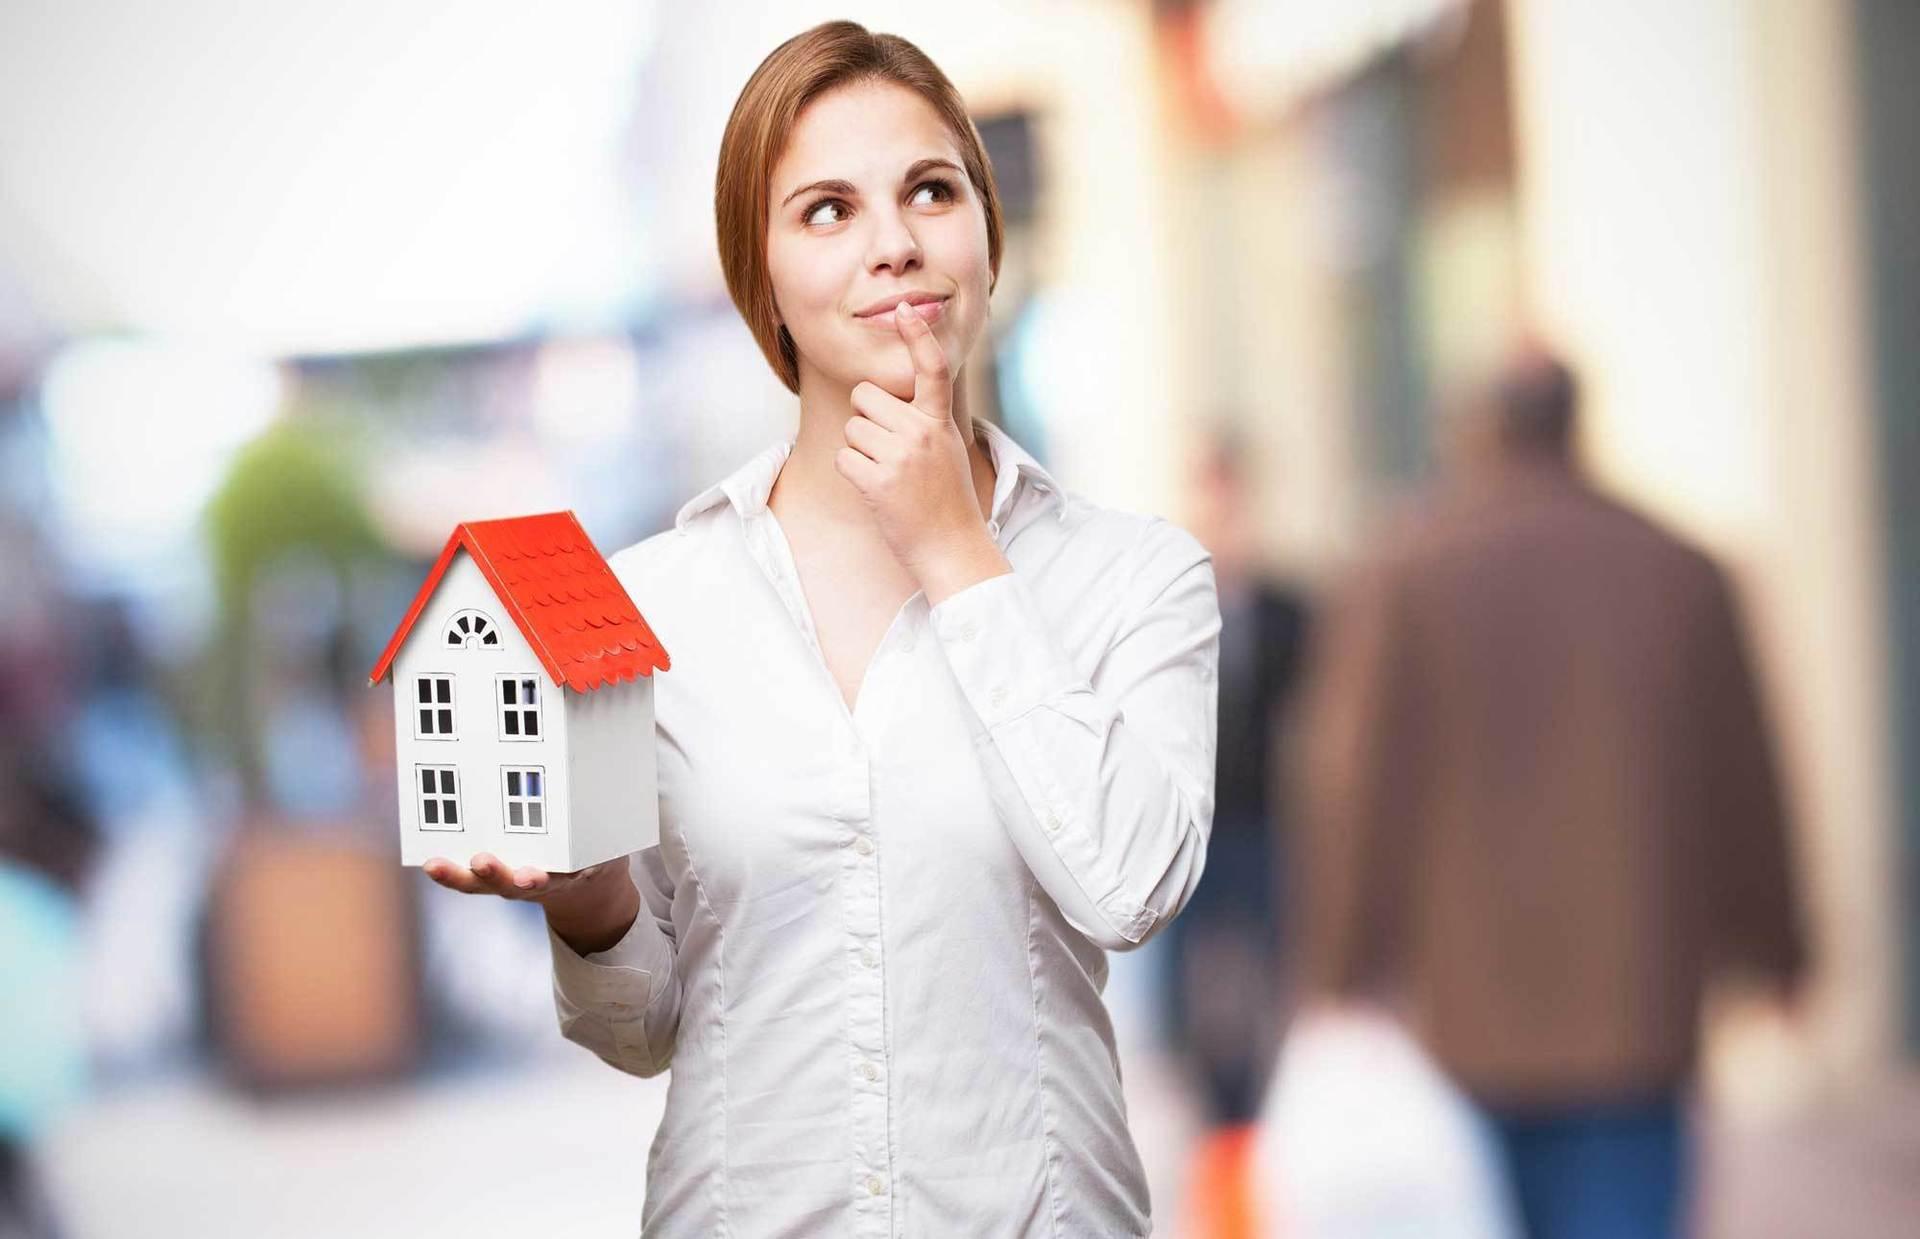 nashville home buyer and seller guides